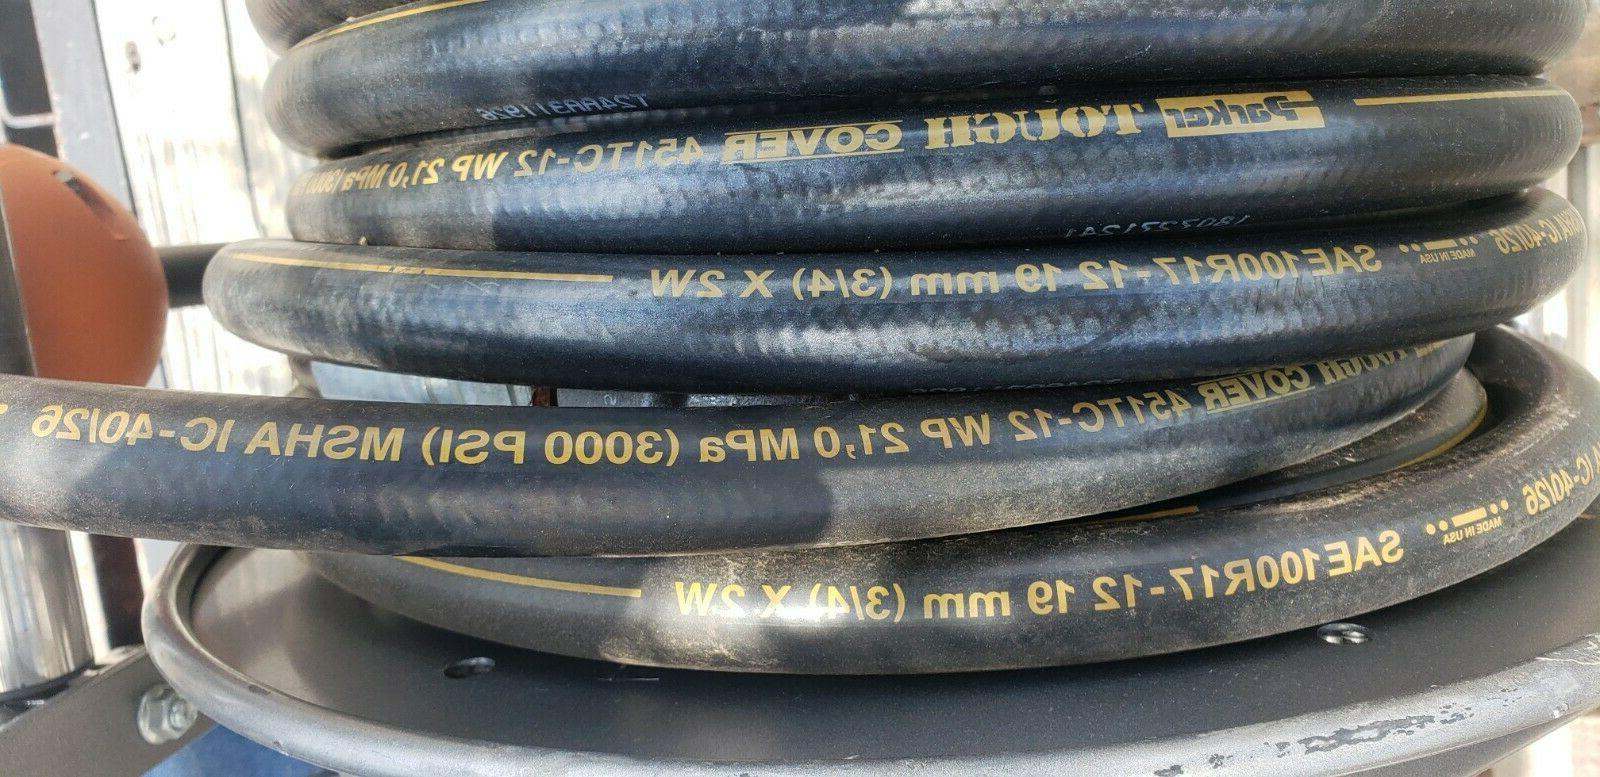 Hannay Electric hydraulic hose with high